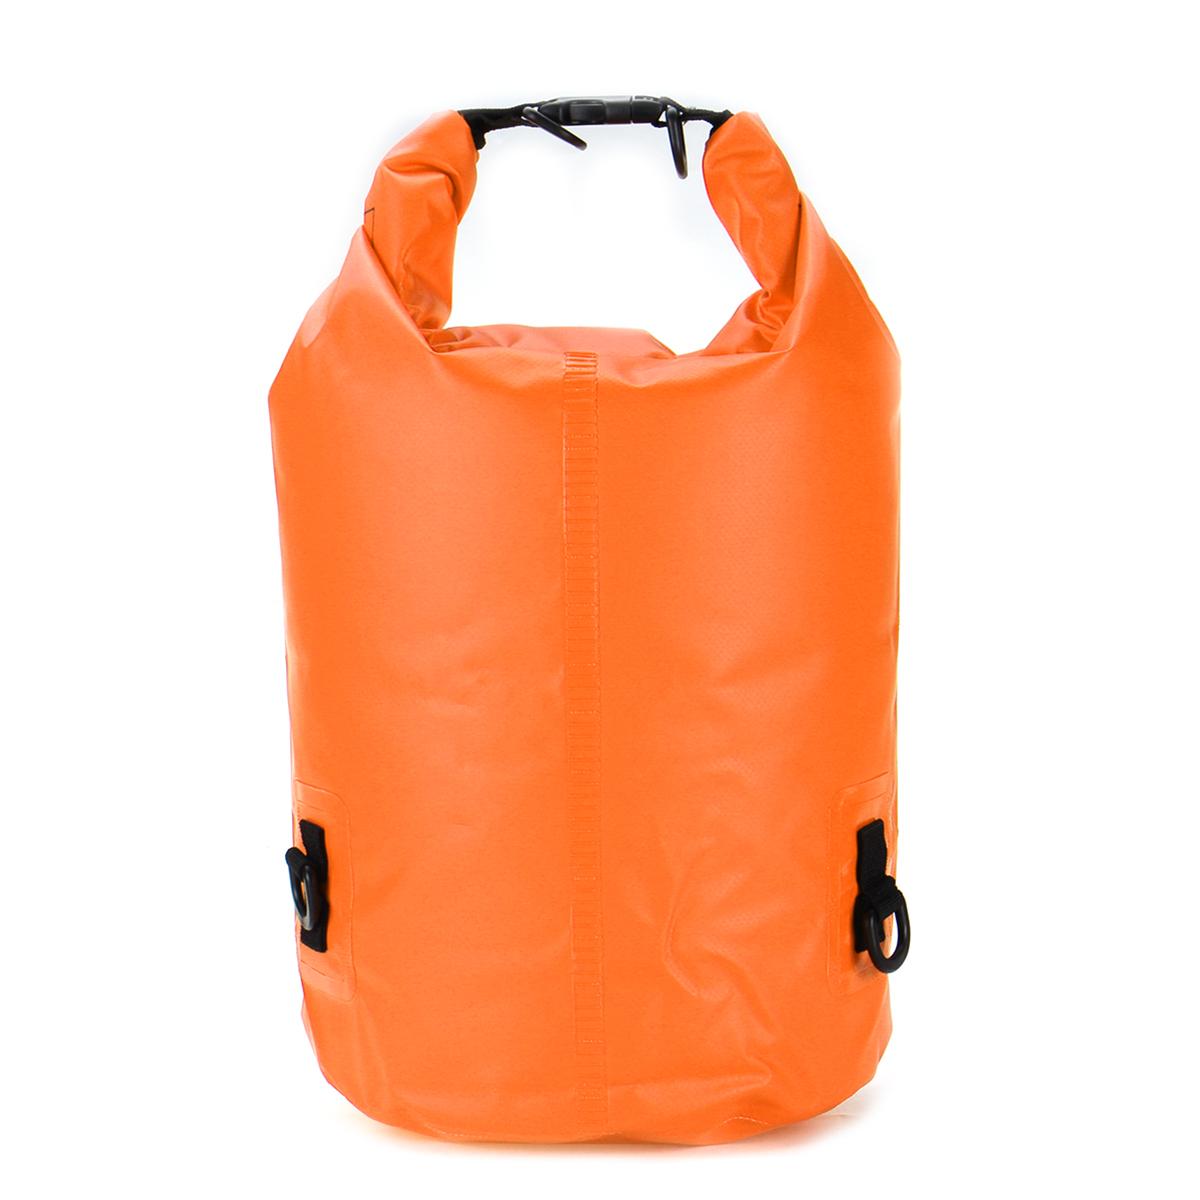 Dry Sack Bag 2/5/10/15/20/30L Waterproof Bag Swimming Dry Wet Cloth Bag Sack for Kayak Canoeing